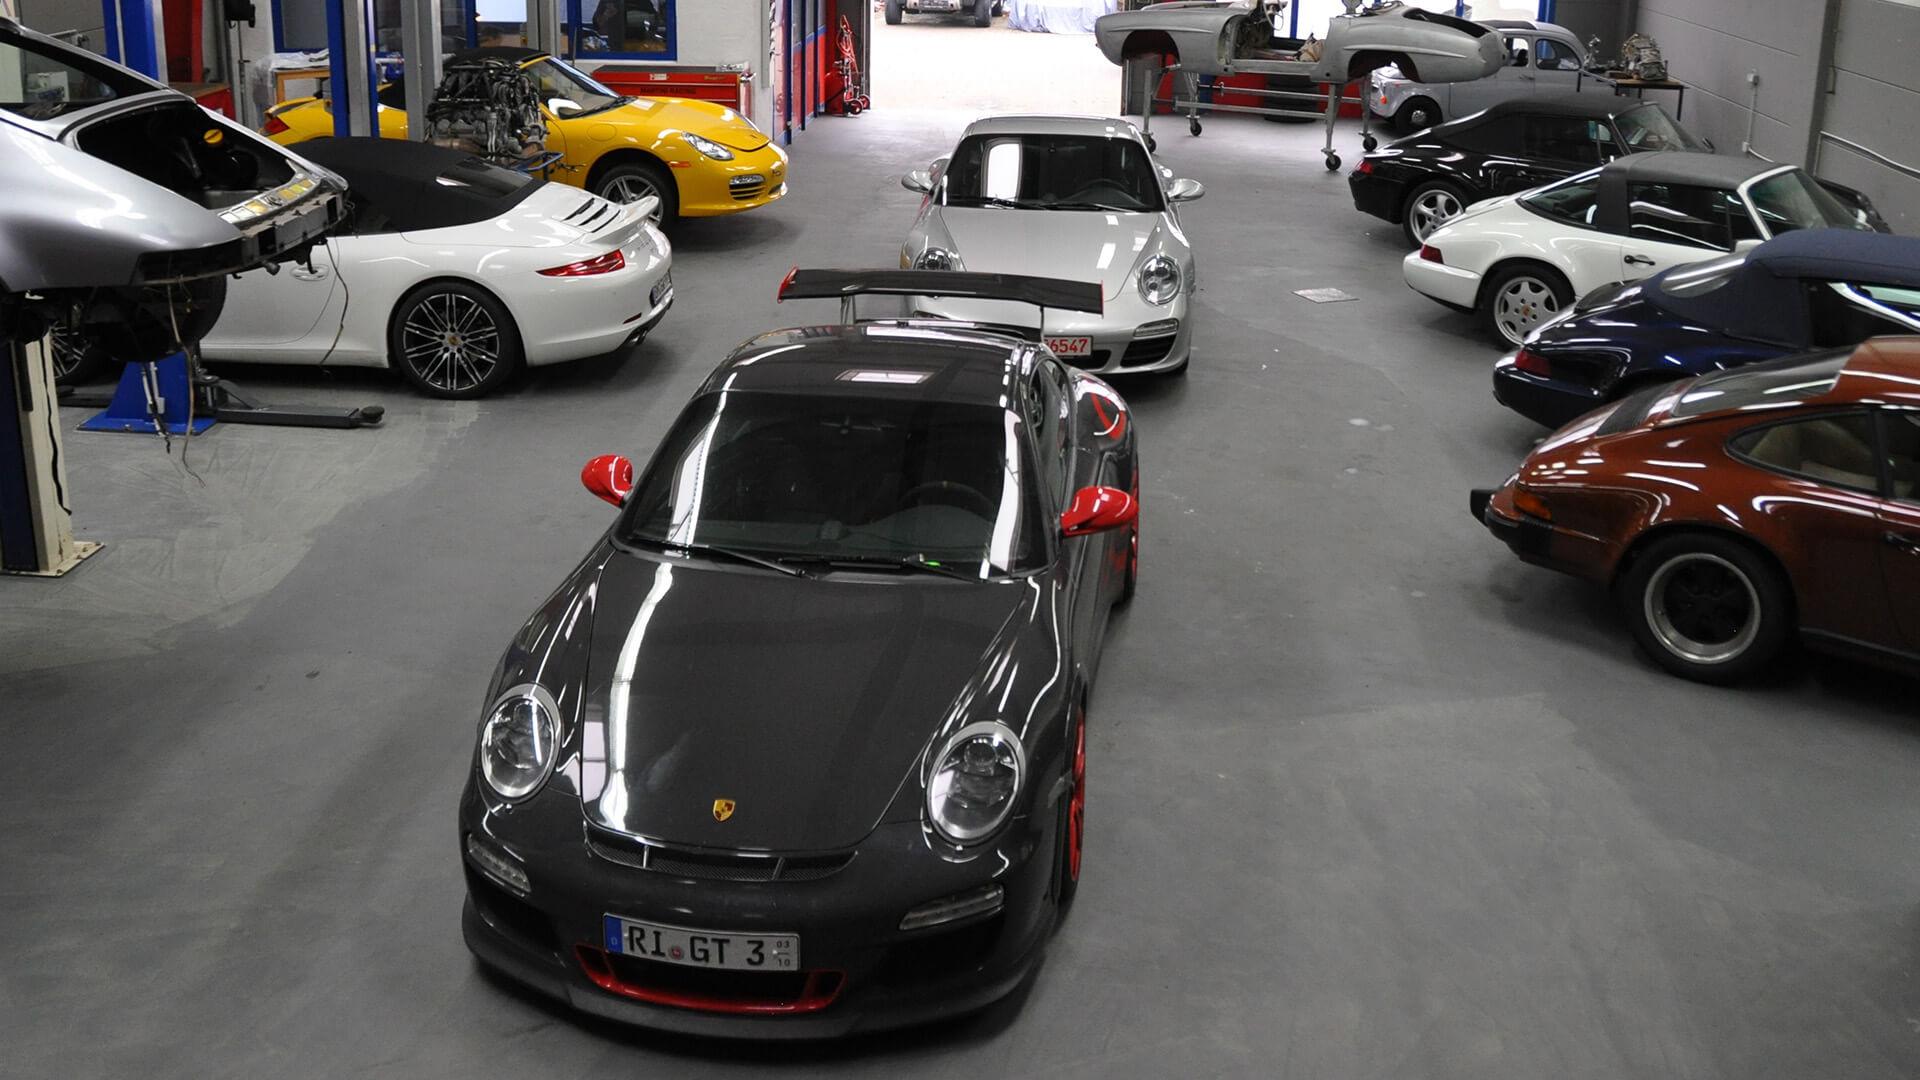 GT Sportwagen Galerie Bild Nr 4